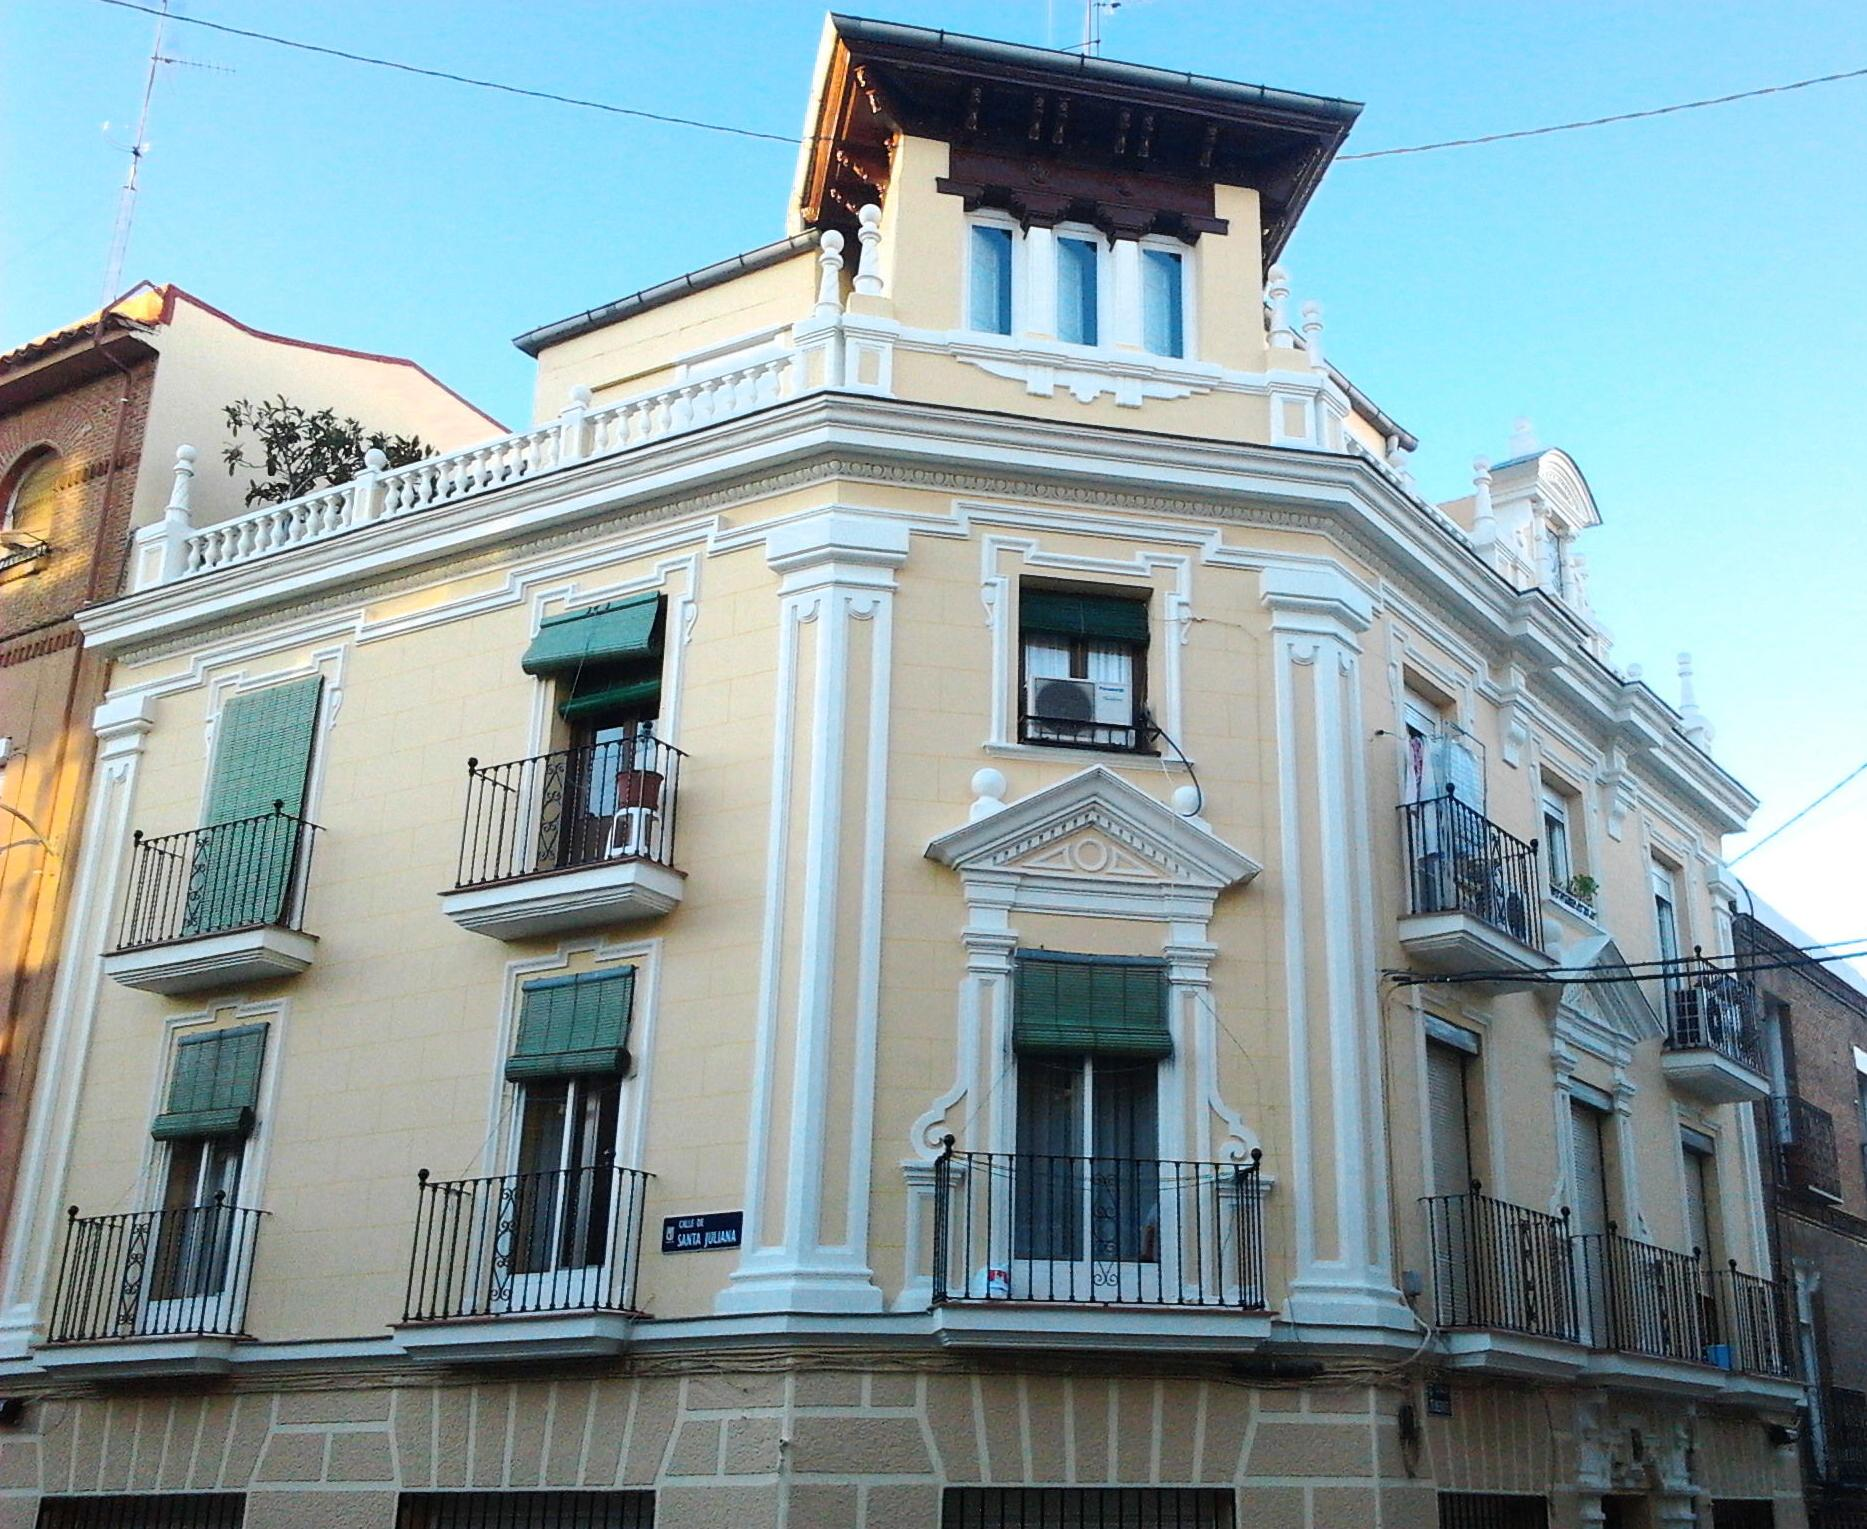 Foto 13 de Rehabilitación de edificios en Madrid | Elax Rehabilitación